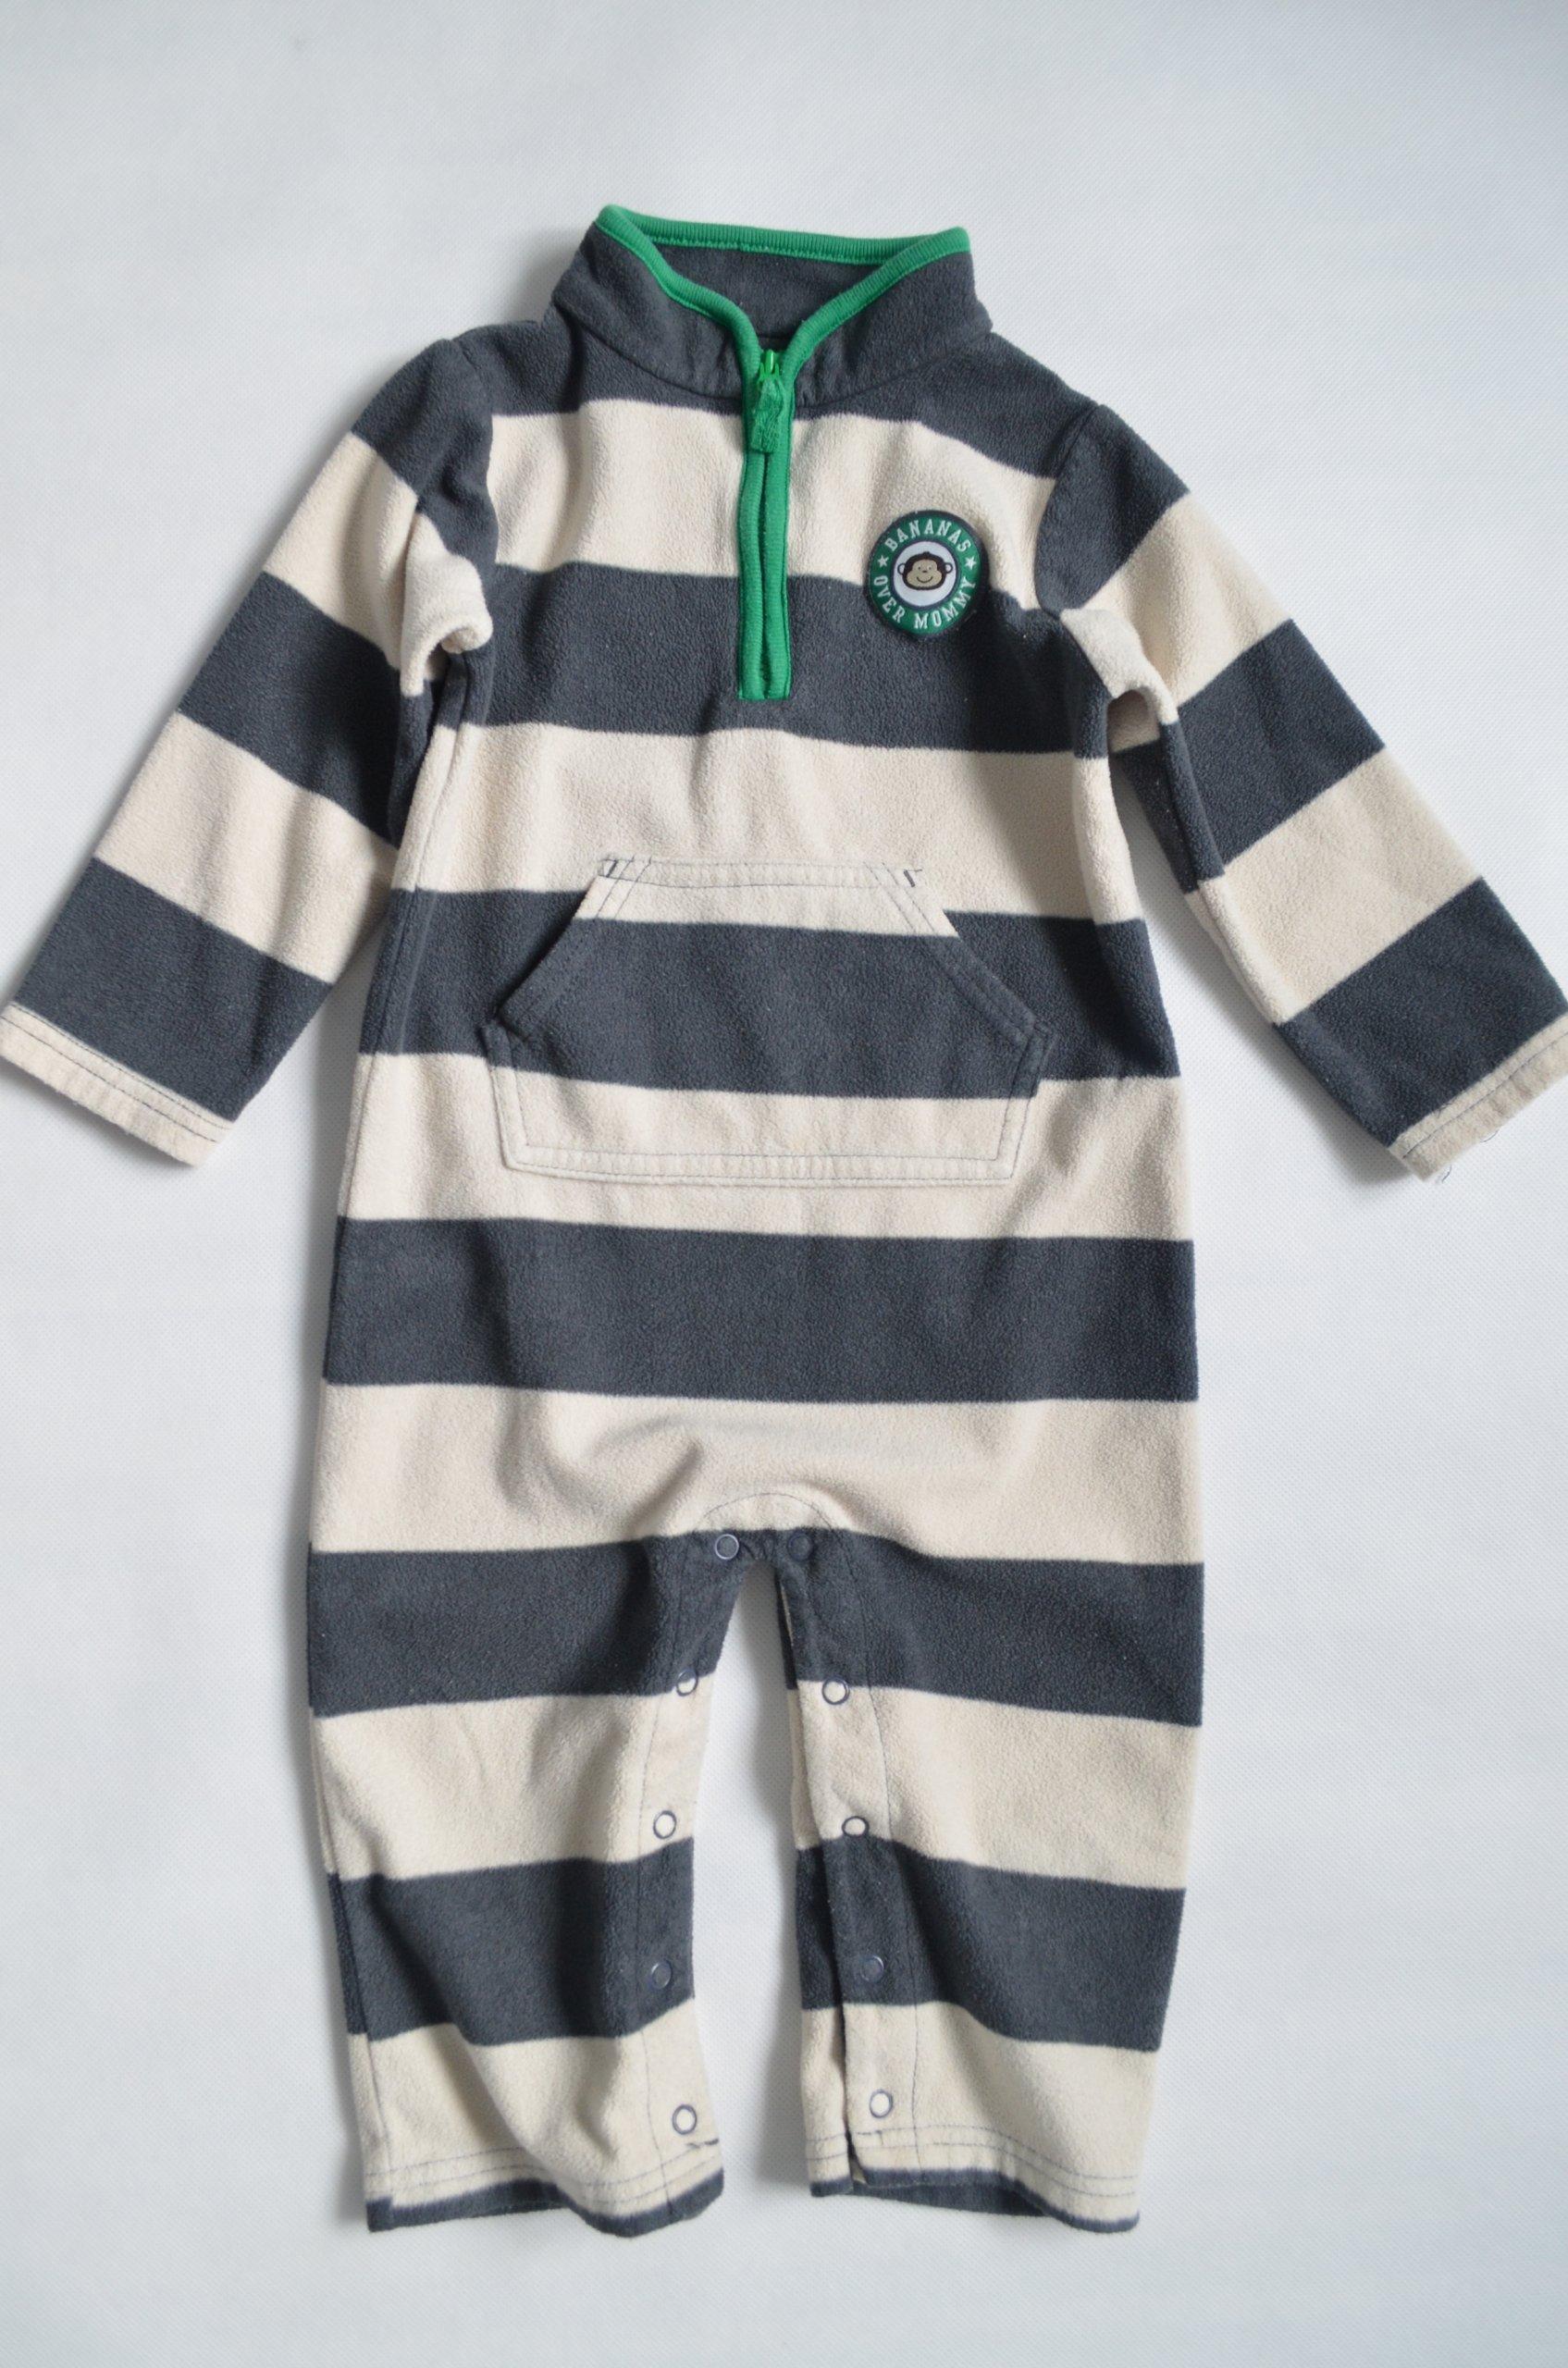 Polarkowy dres kombinezon Carter's rozm 92_2l